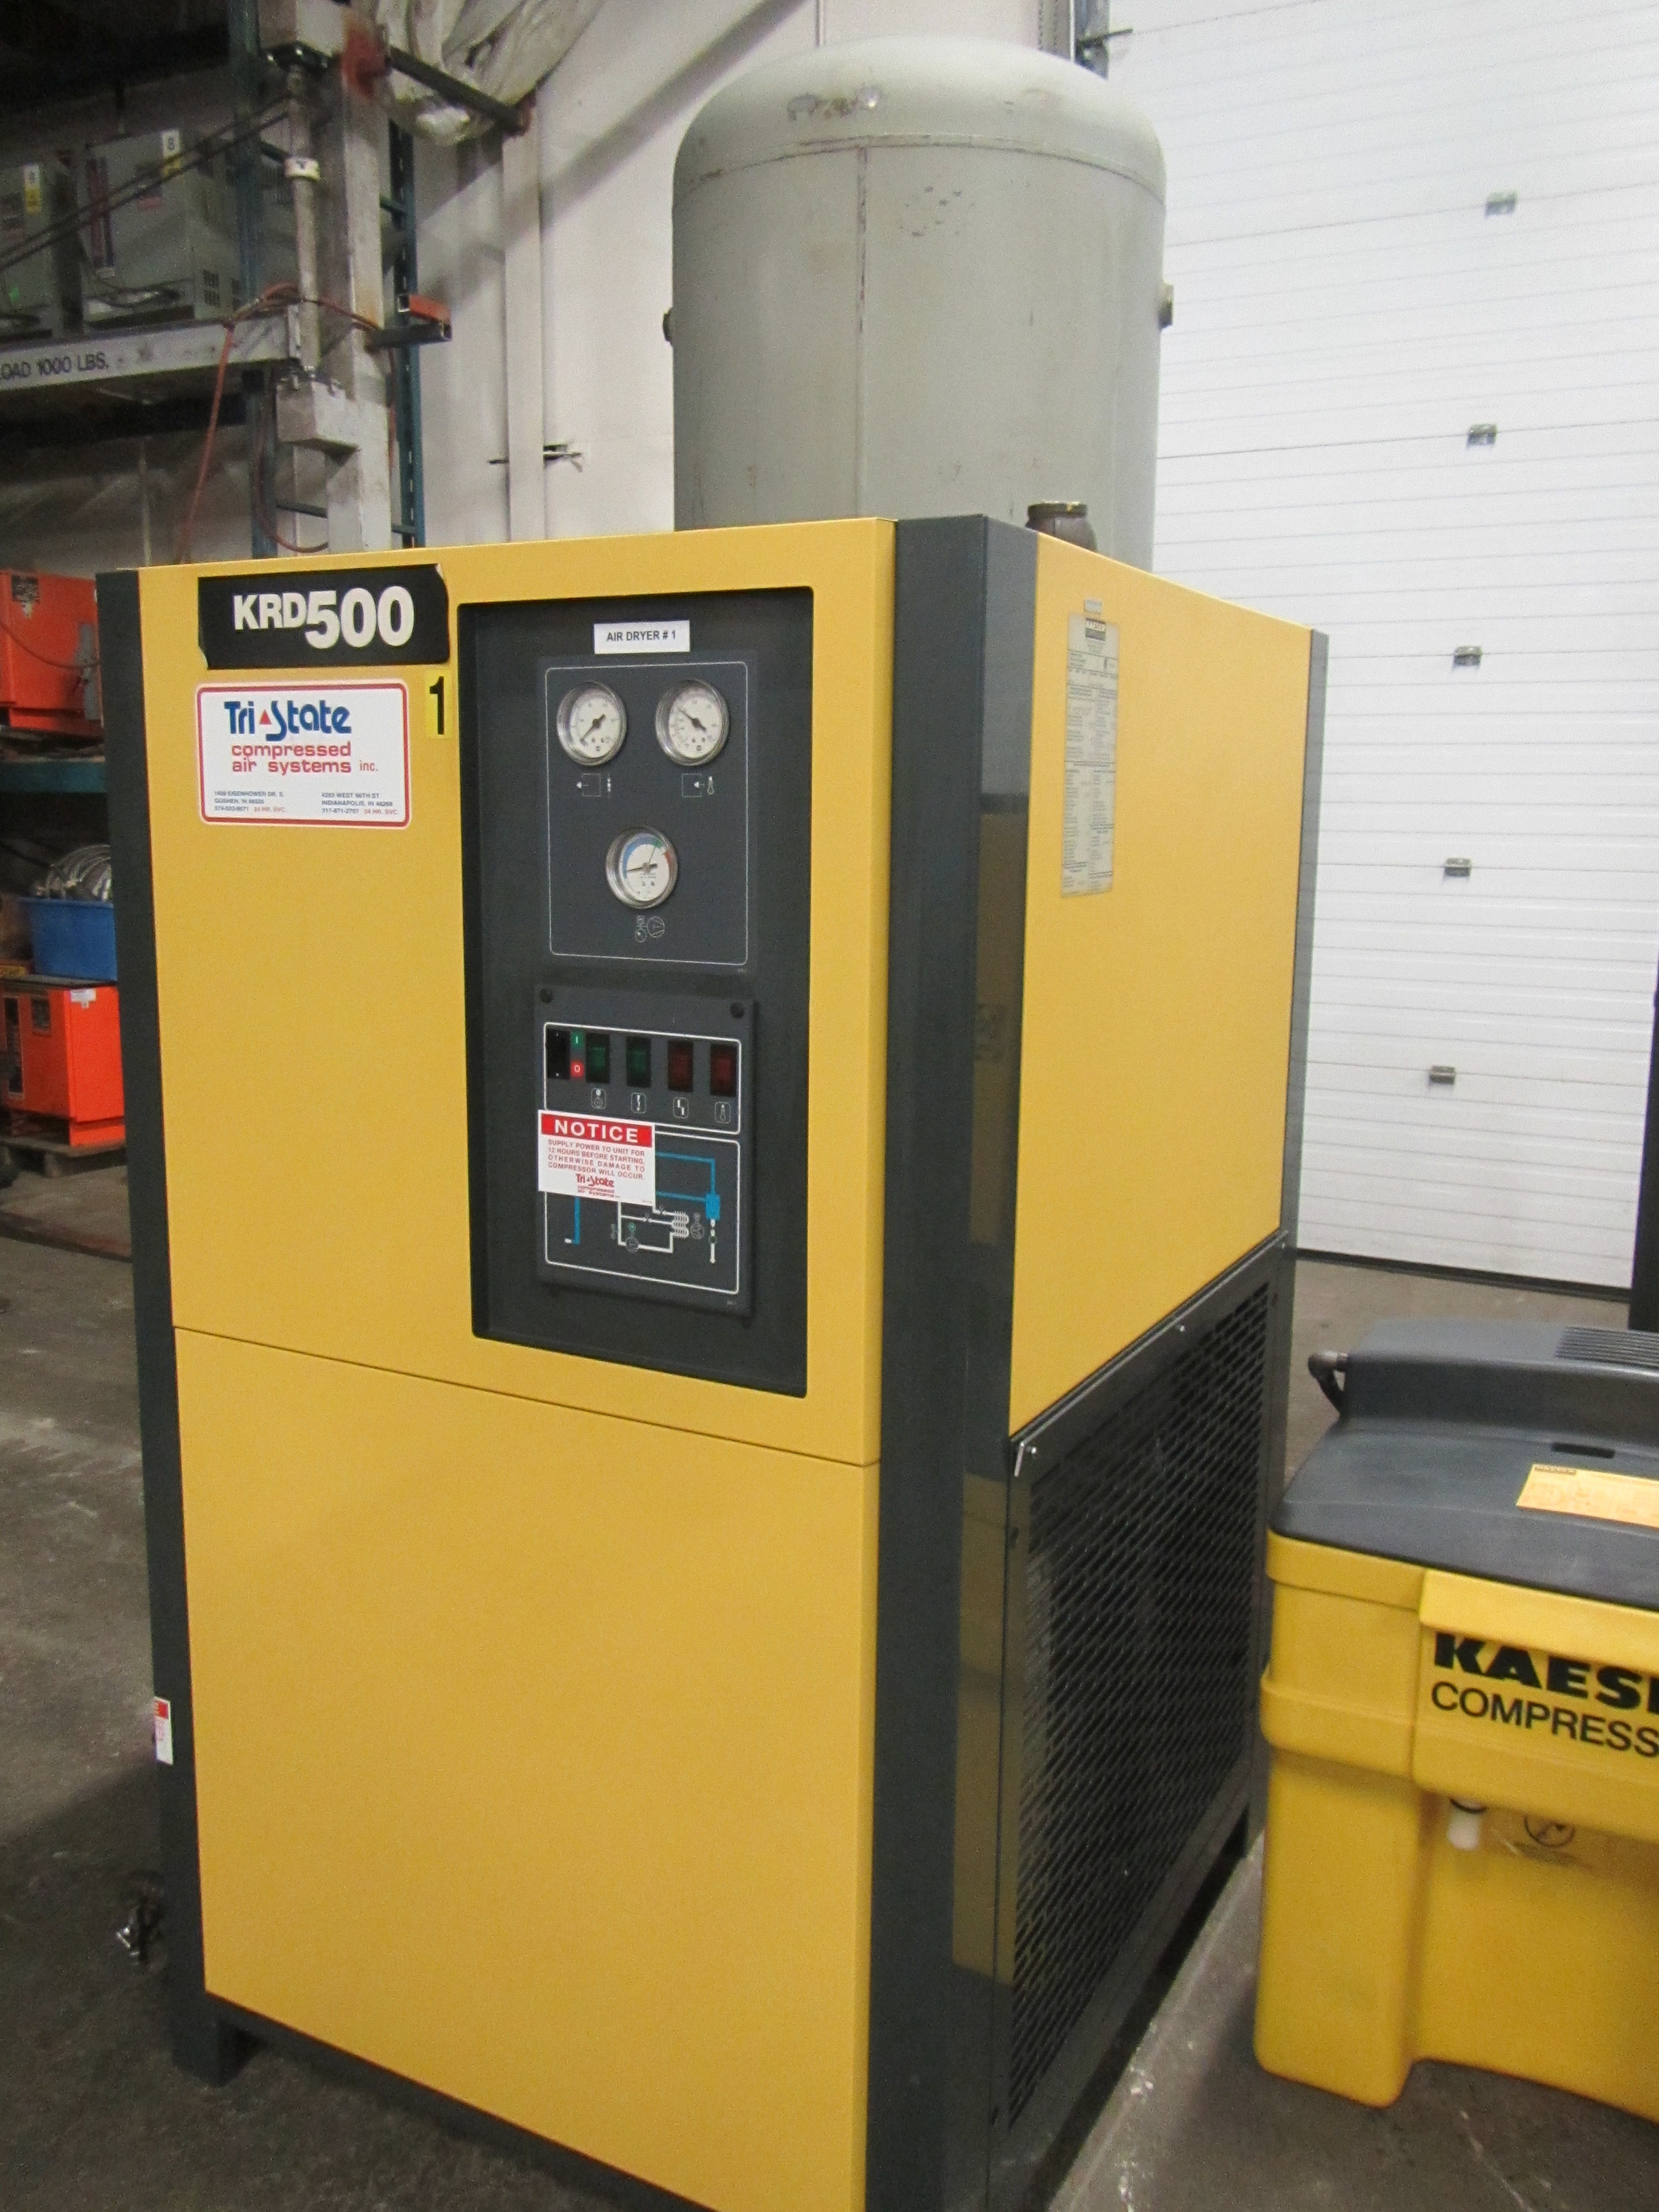 Lot 200 - Kaeser model KRD-500 500CFM Compressed Air Dryer